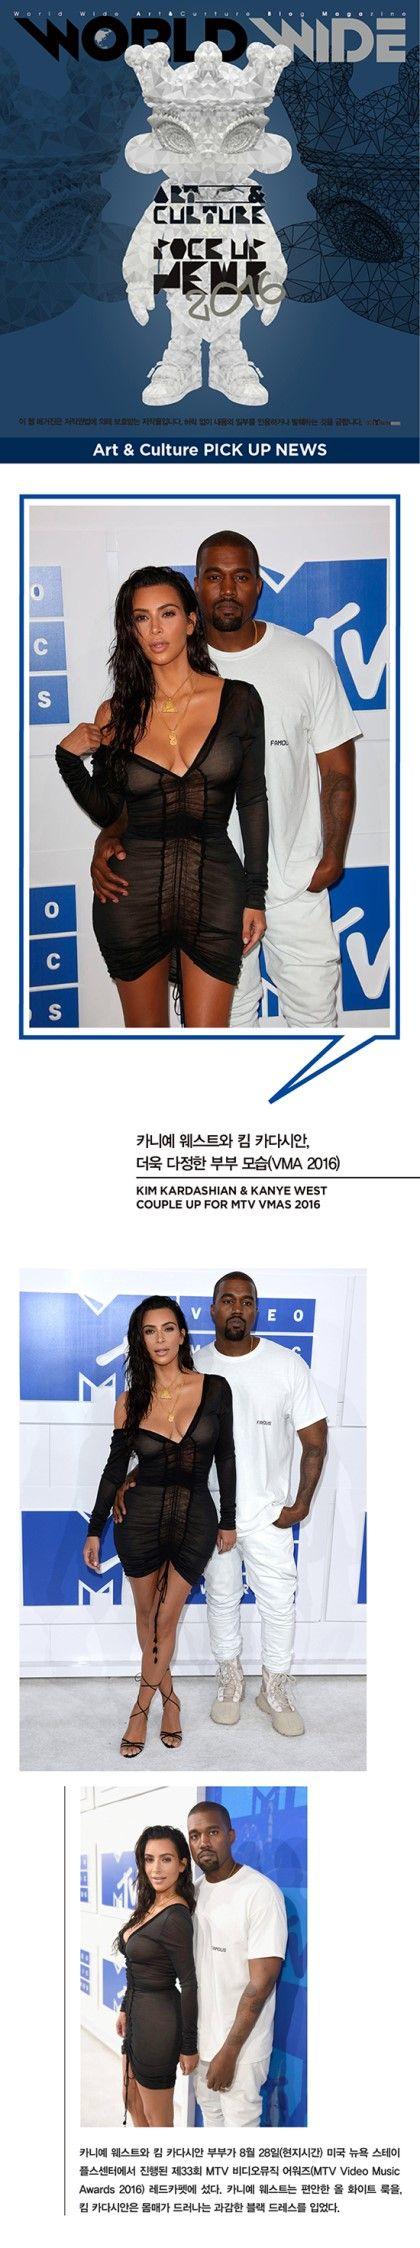 Blog Magazine ● WORLD WIDE: Art & Culture PICK UP NEWS∥카니예 웨스트와 킴 카다시안, 더욱 다정한 부부 모습(VMA 2016)